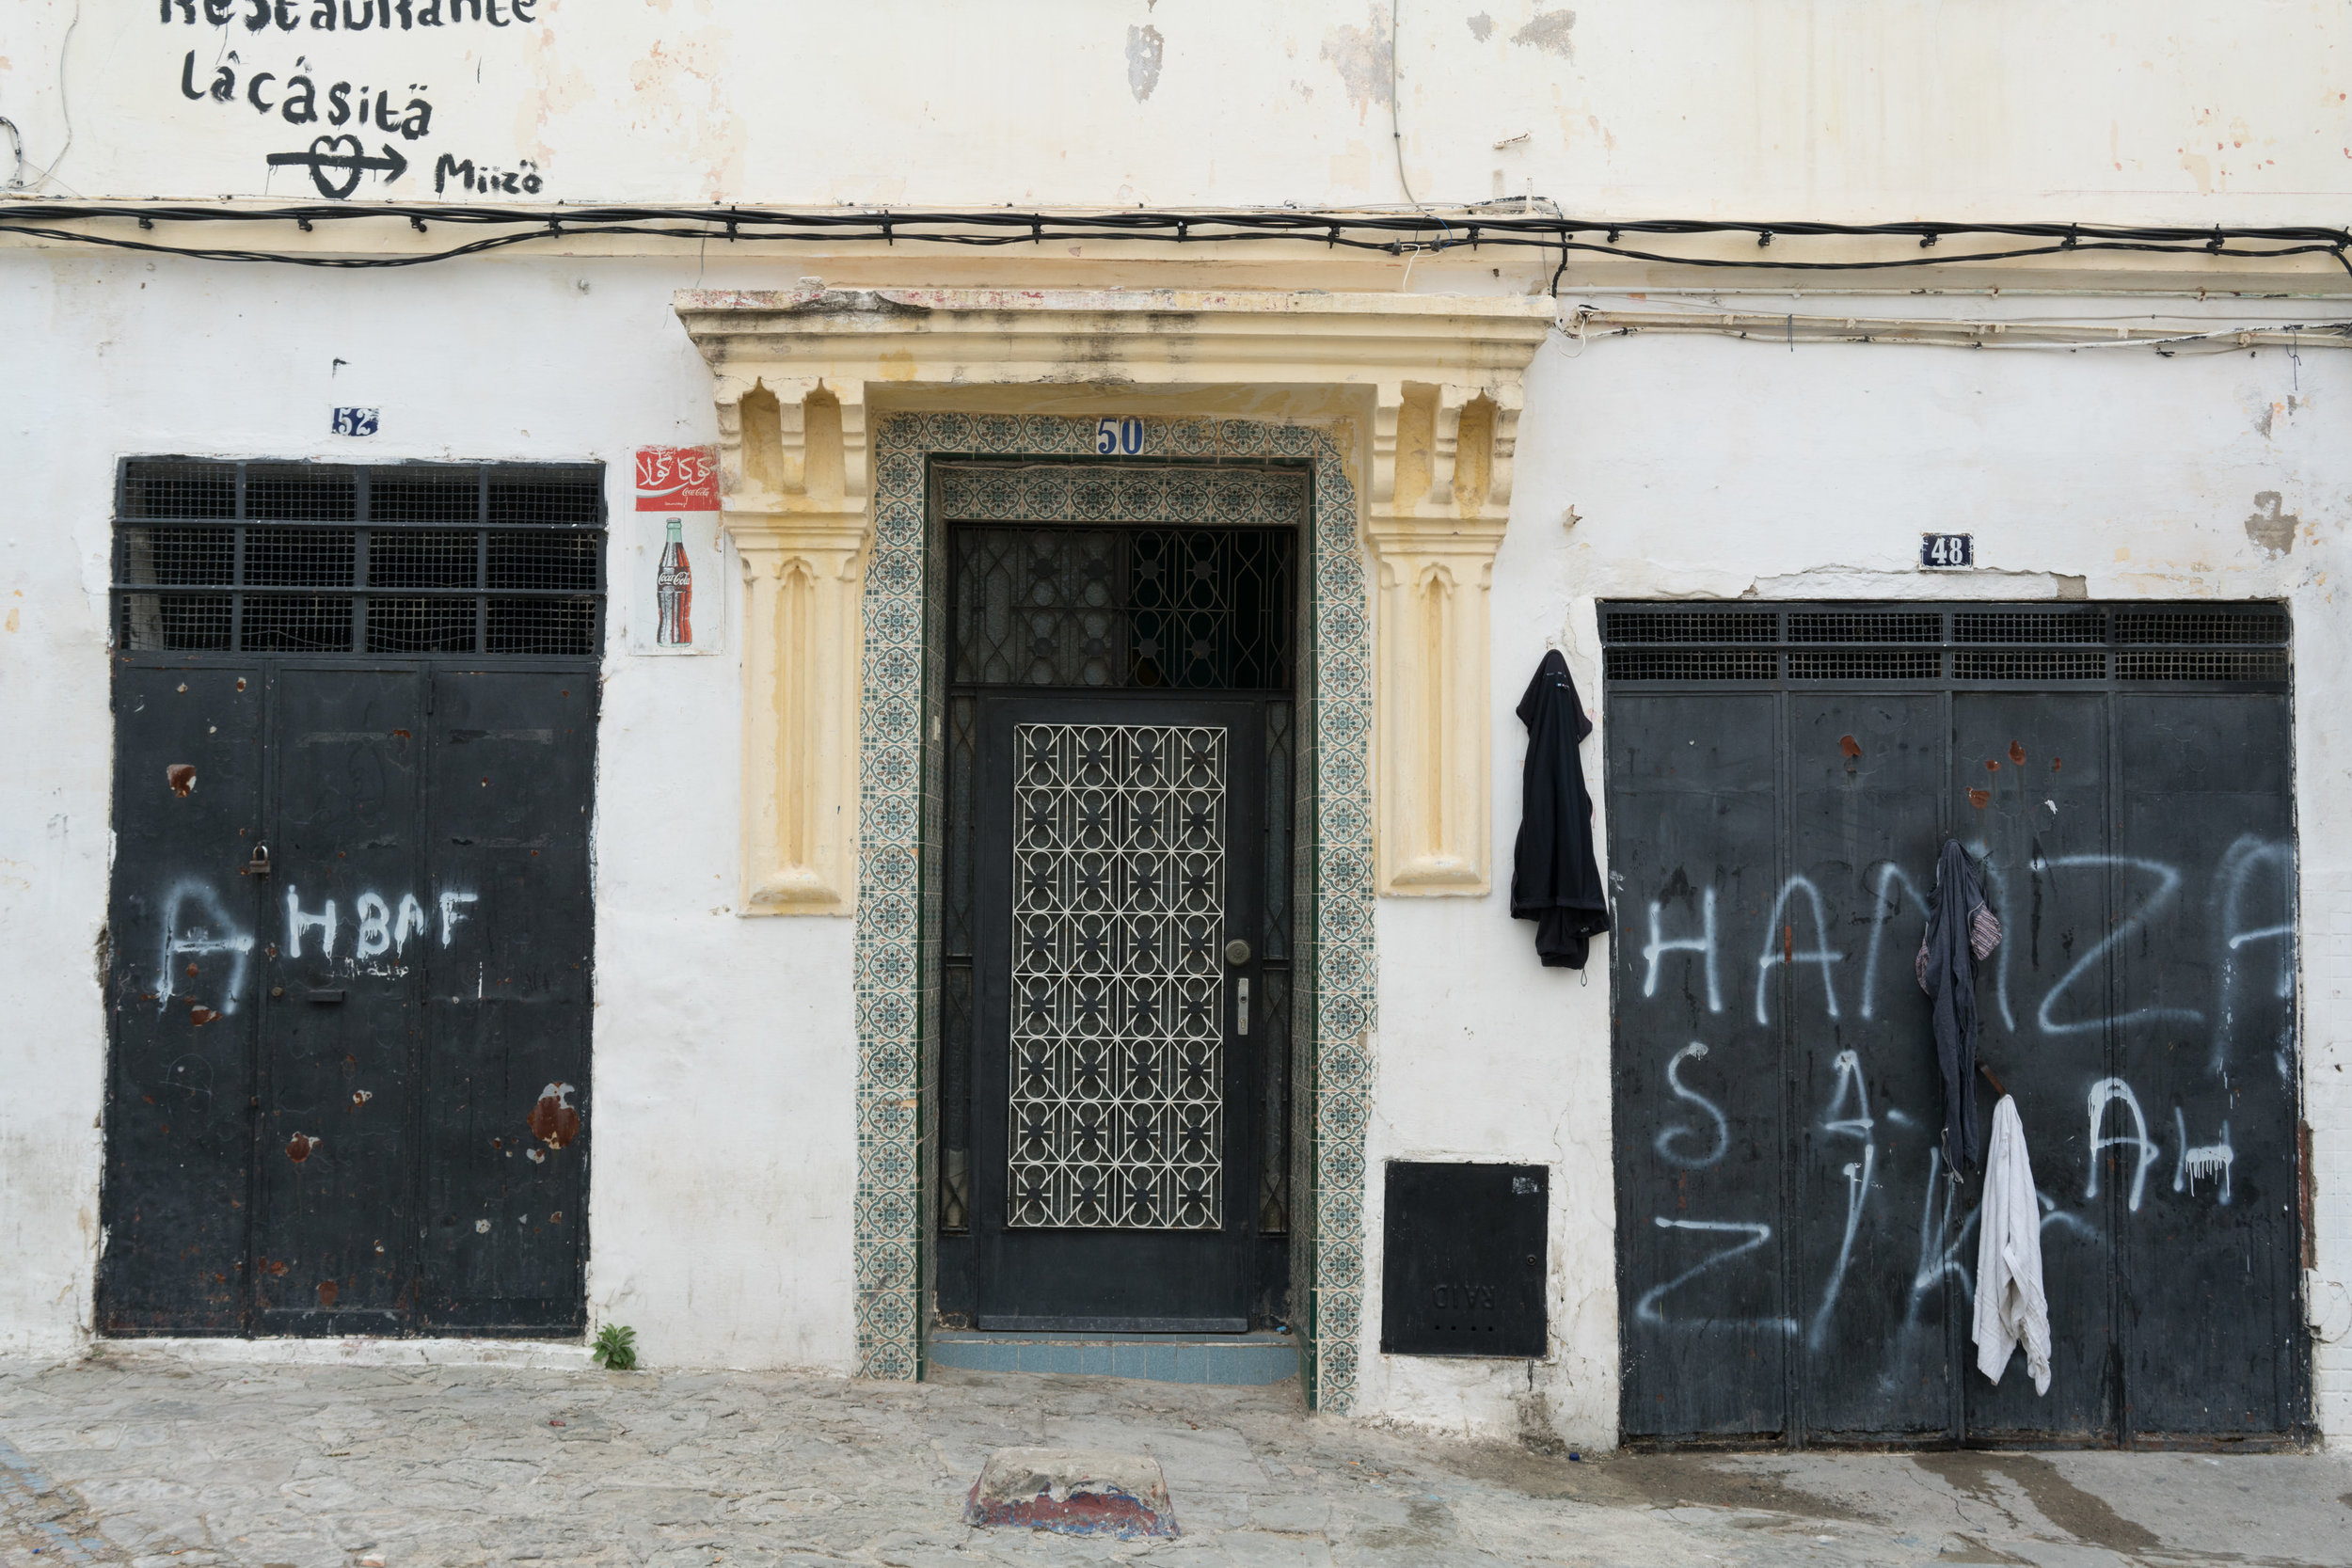 futuristphil_Morocco_4_20_2018_RXfull (44 of 434).jpg